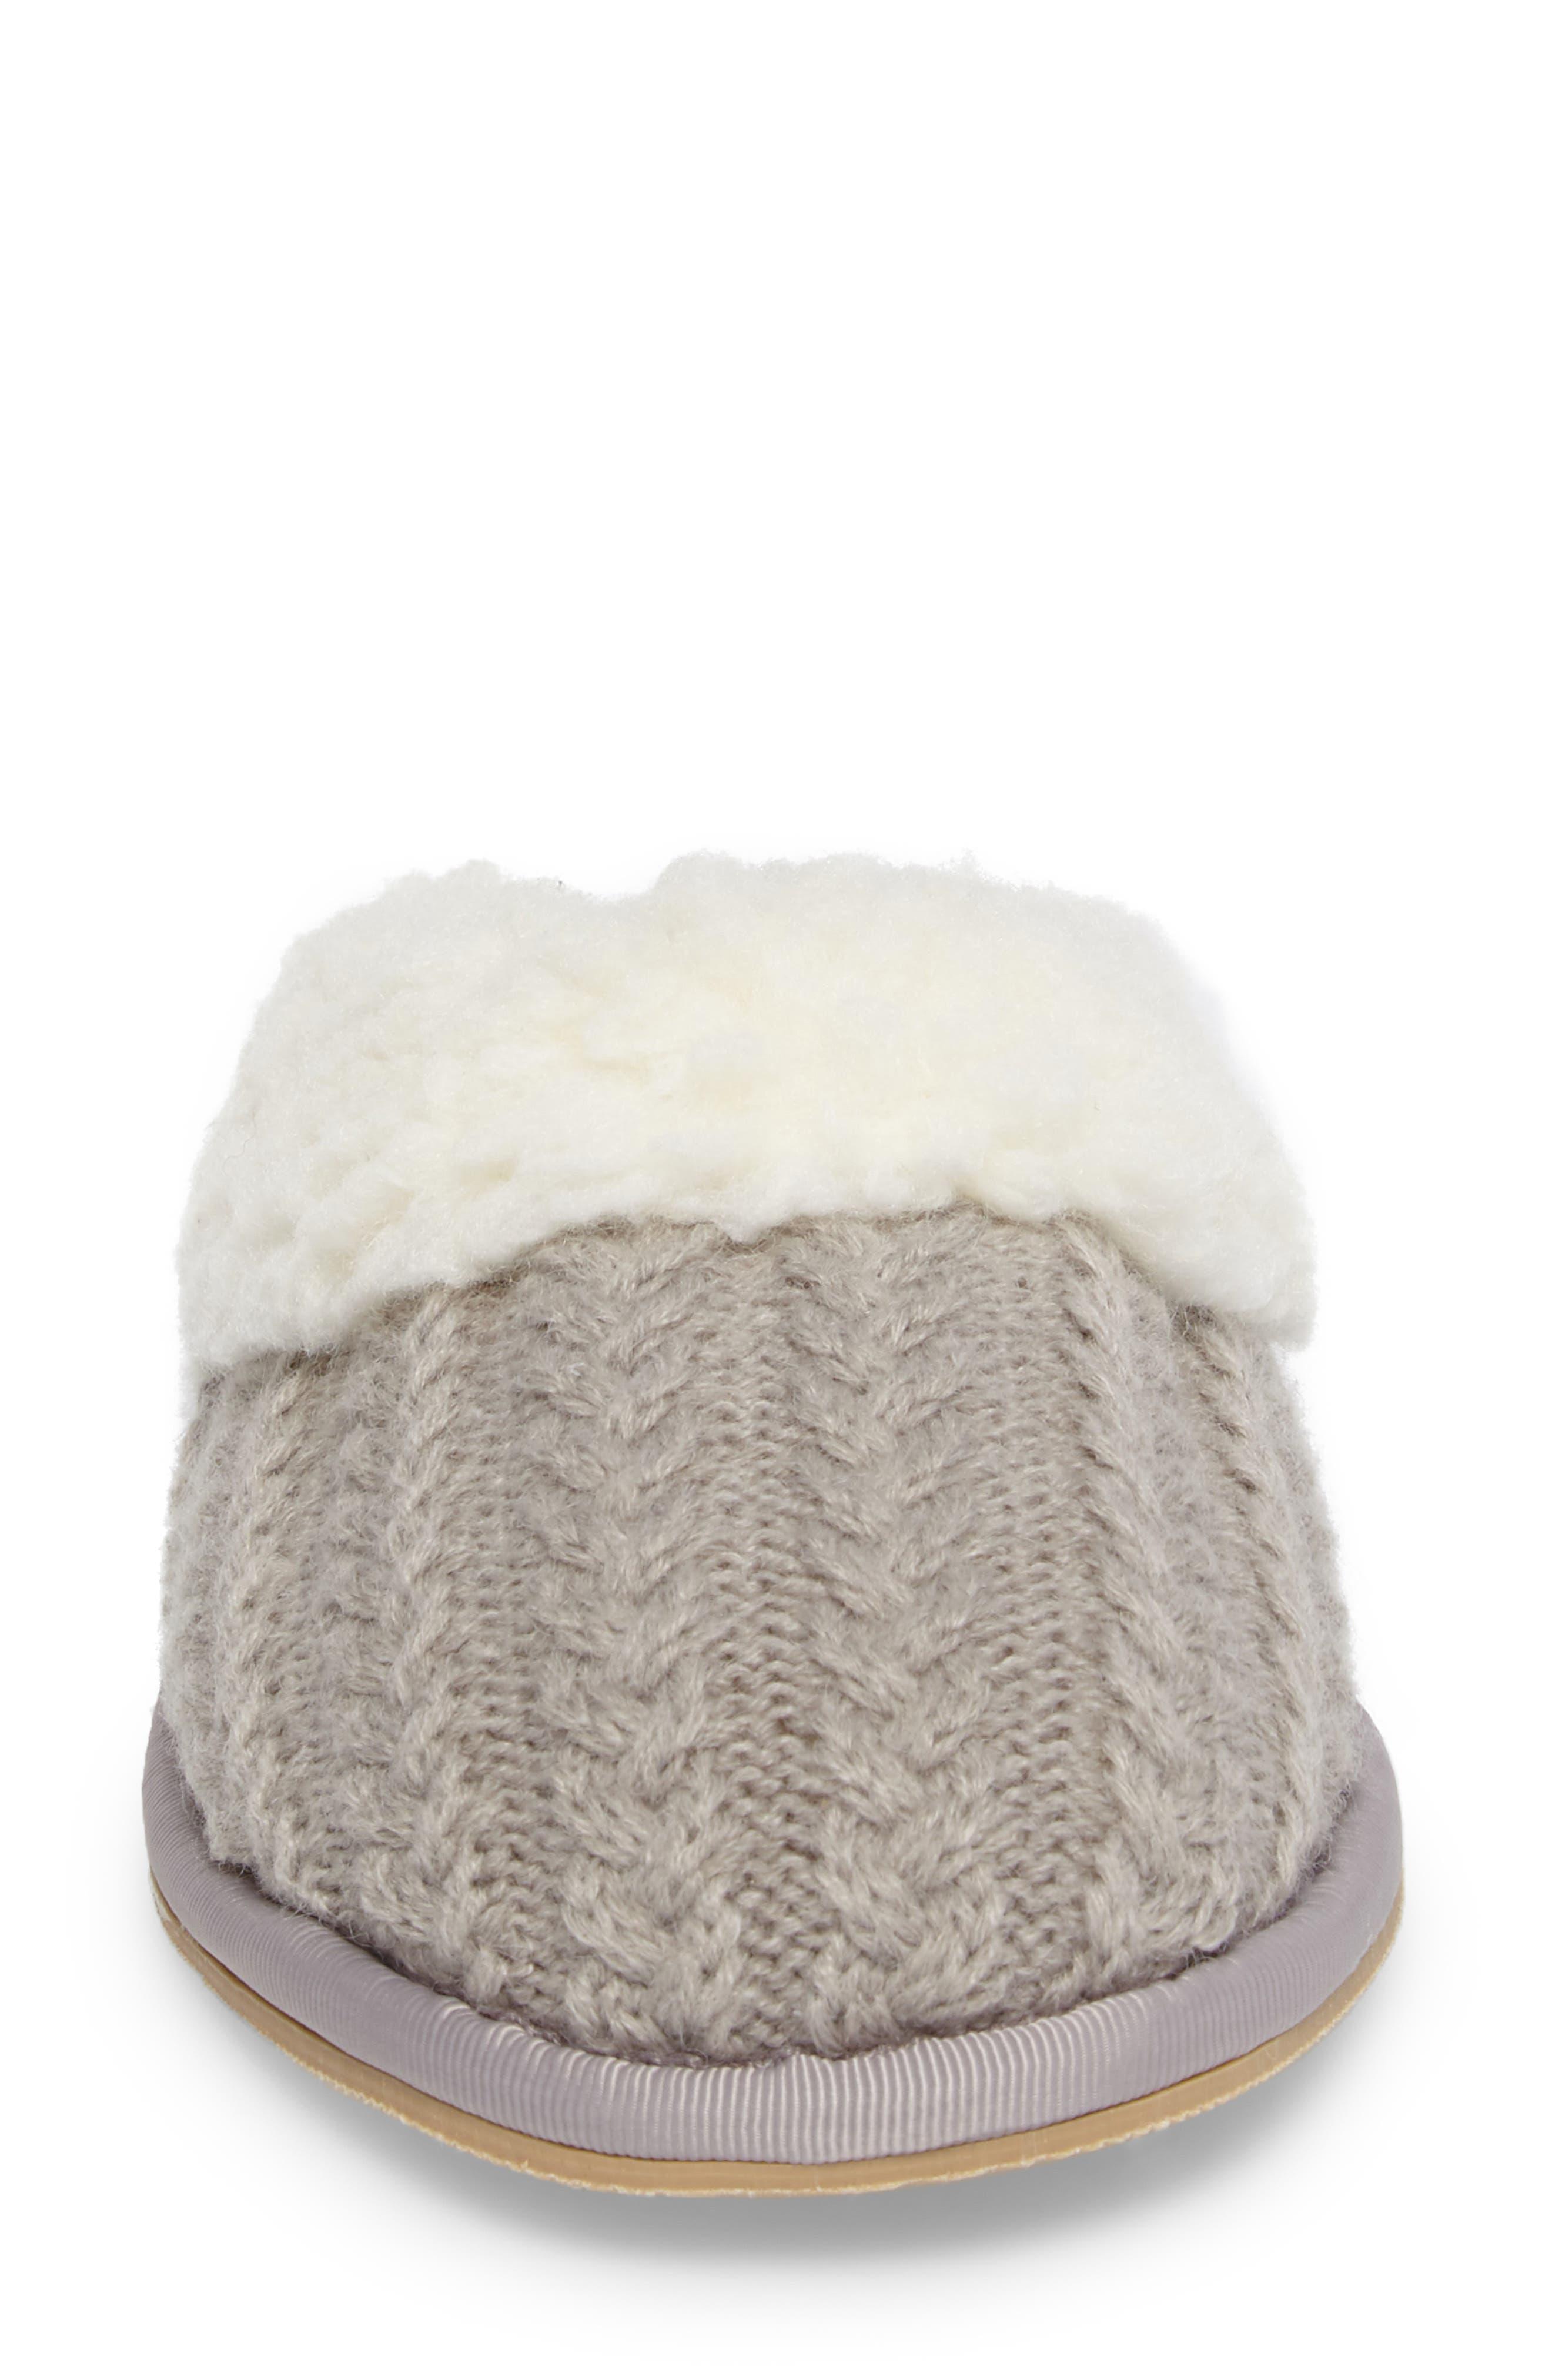 Celia Cable Knit Slipper,                             Alternate thumbnail 4, color,                             Grey Fabric